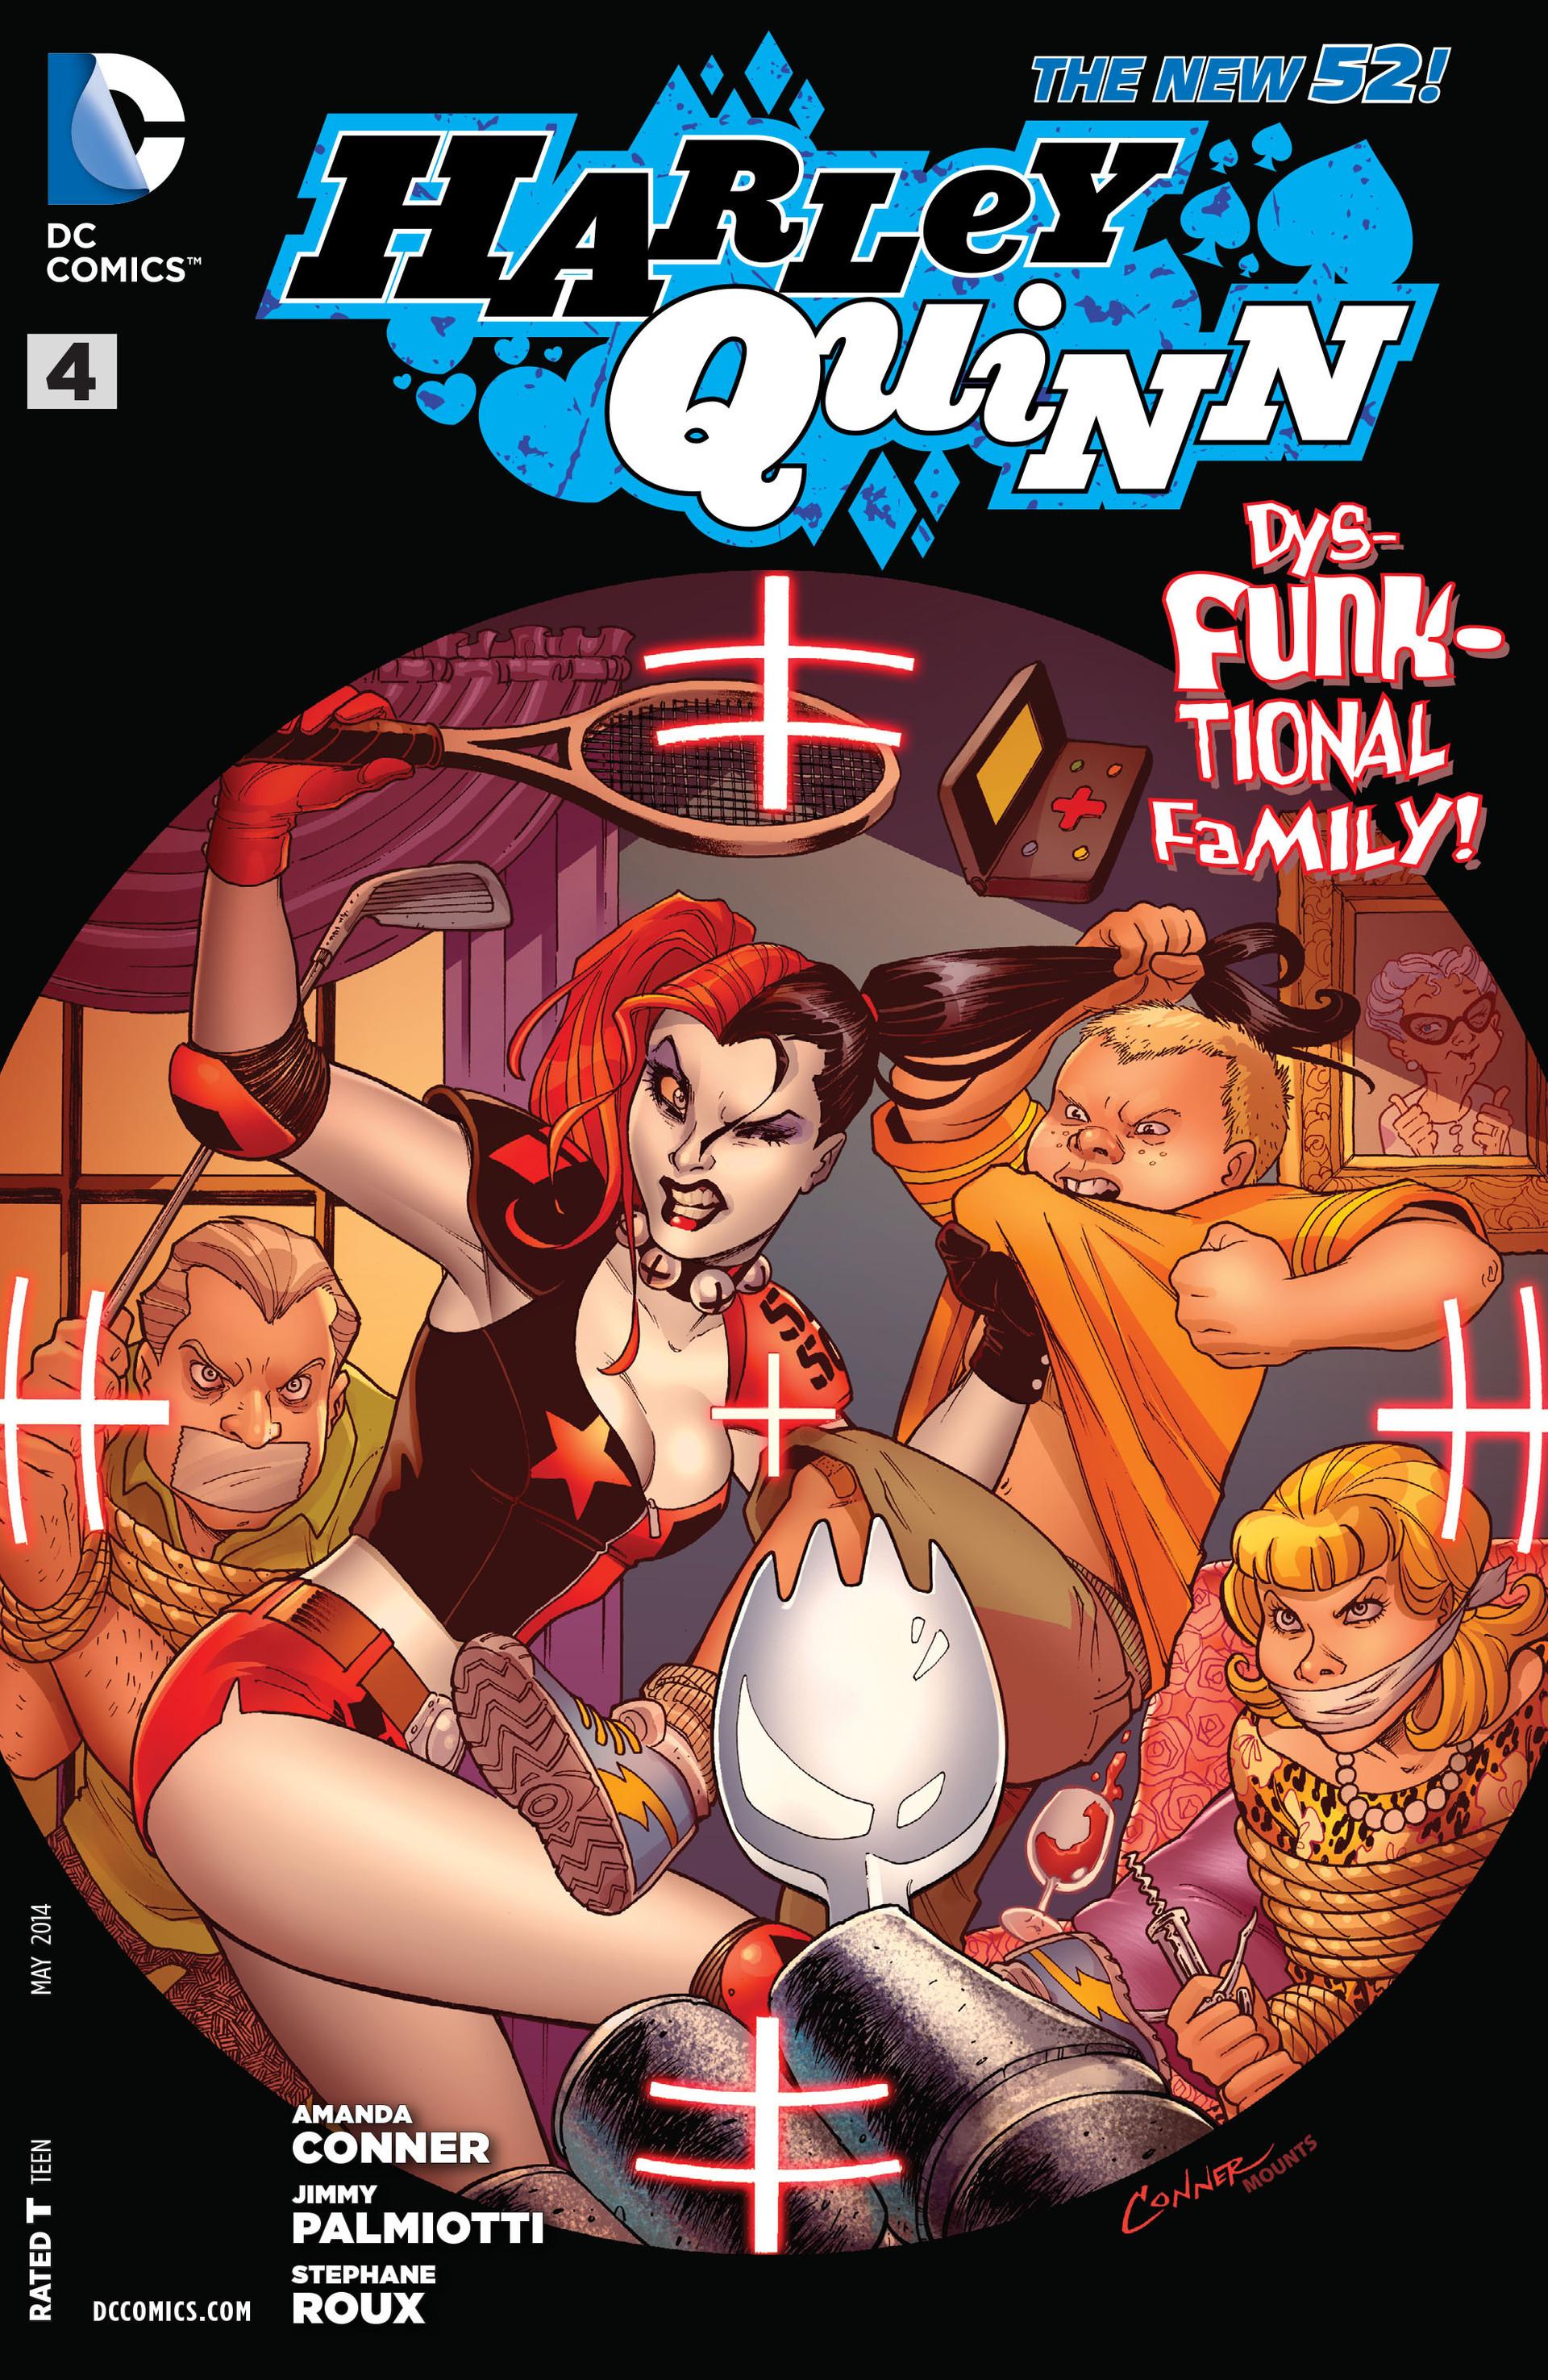 harley quinn volume 2 issue 4 batman wiki fandom powered by wikia